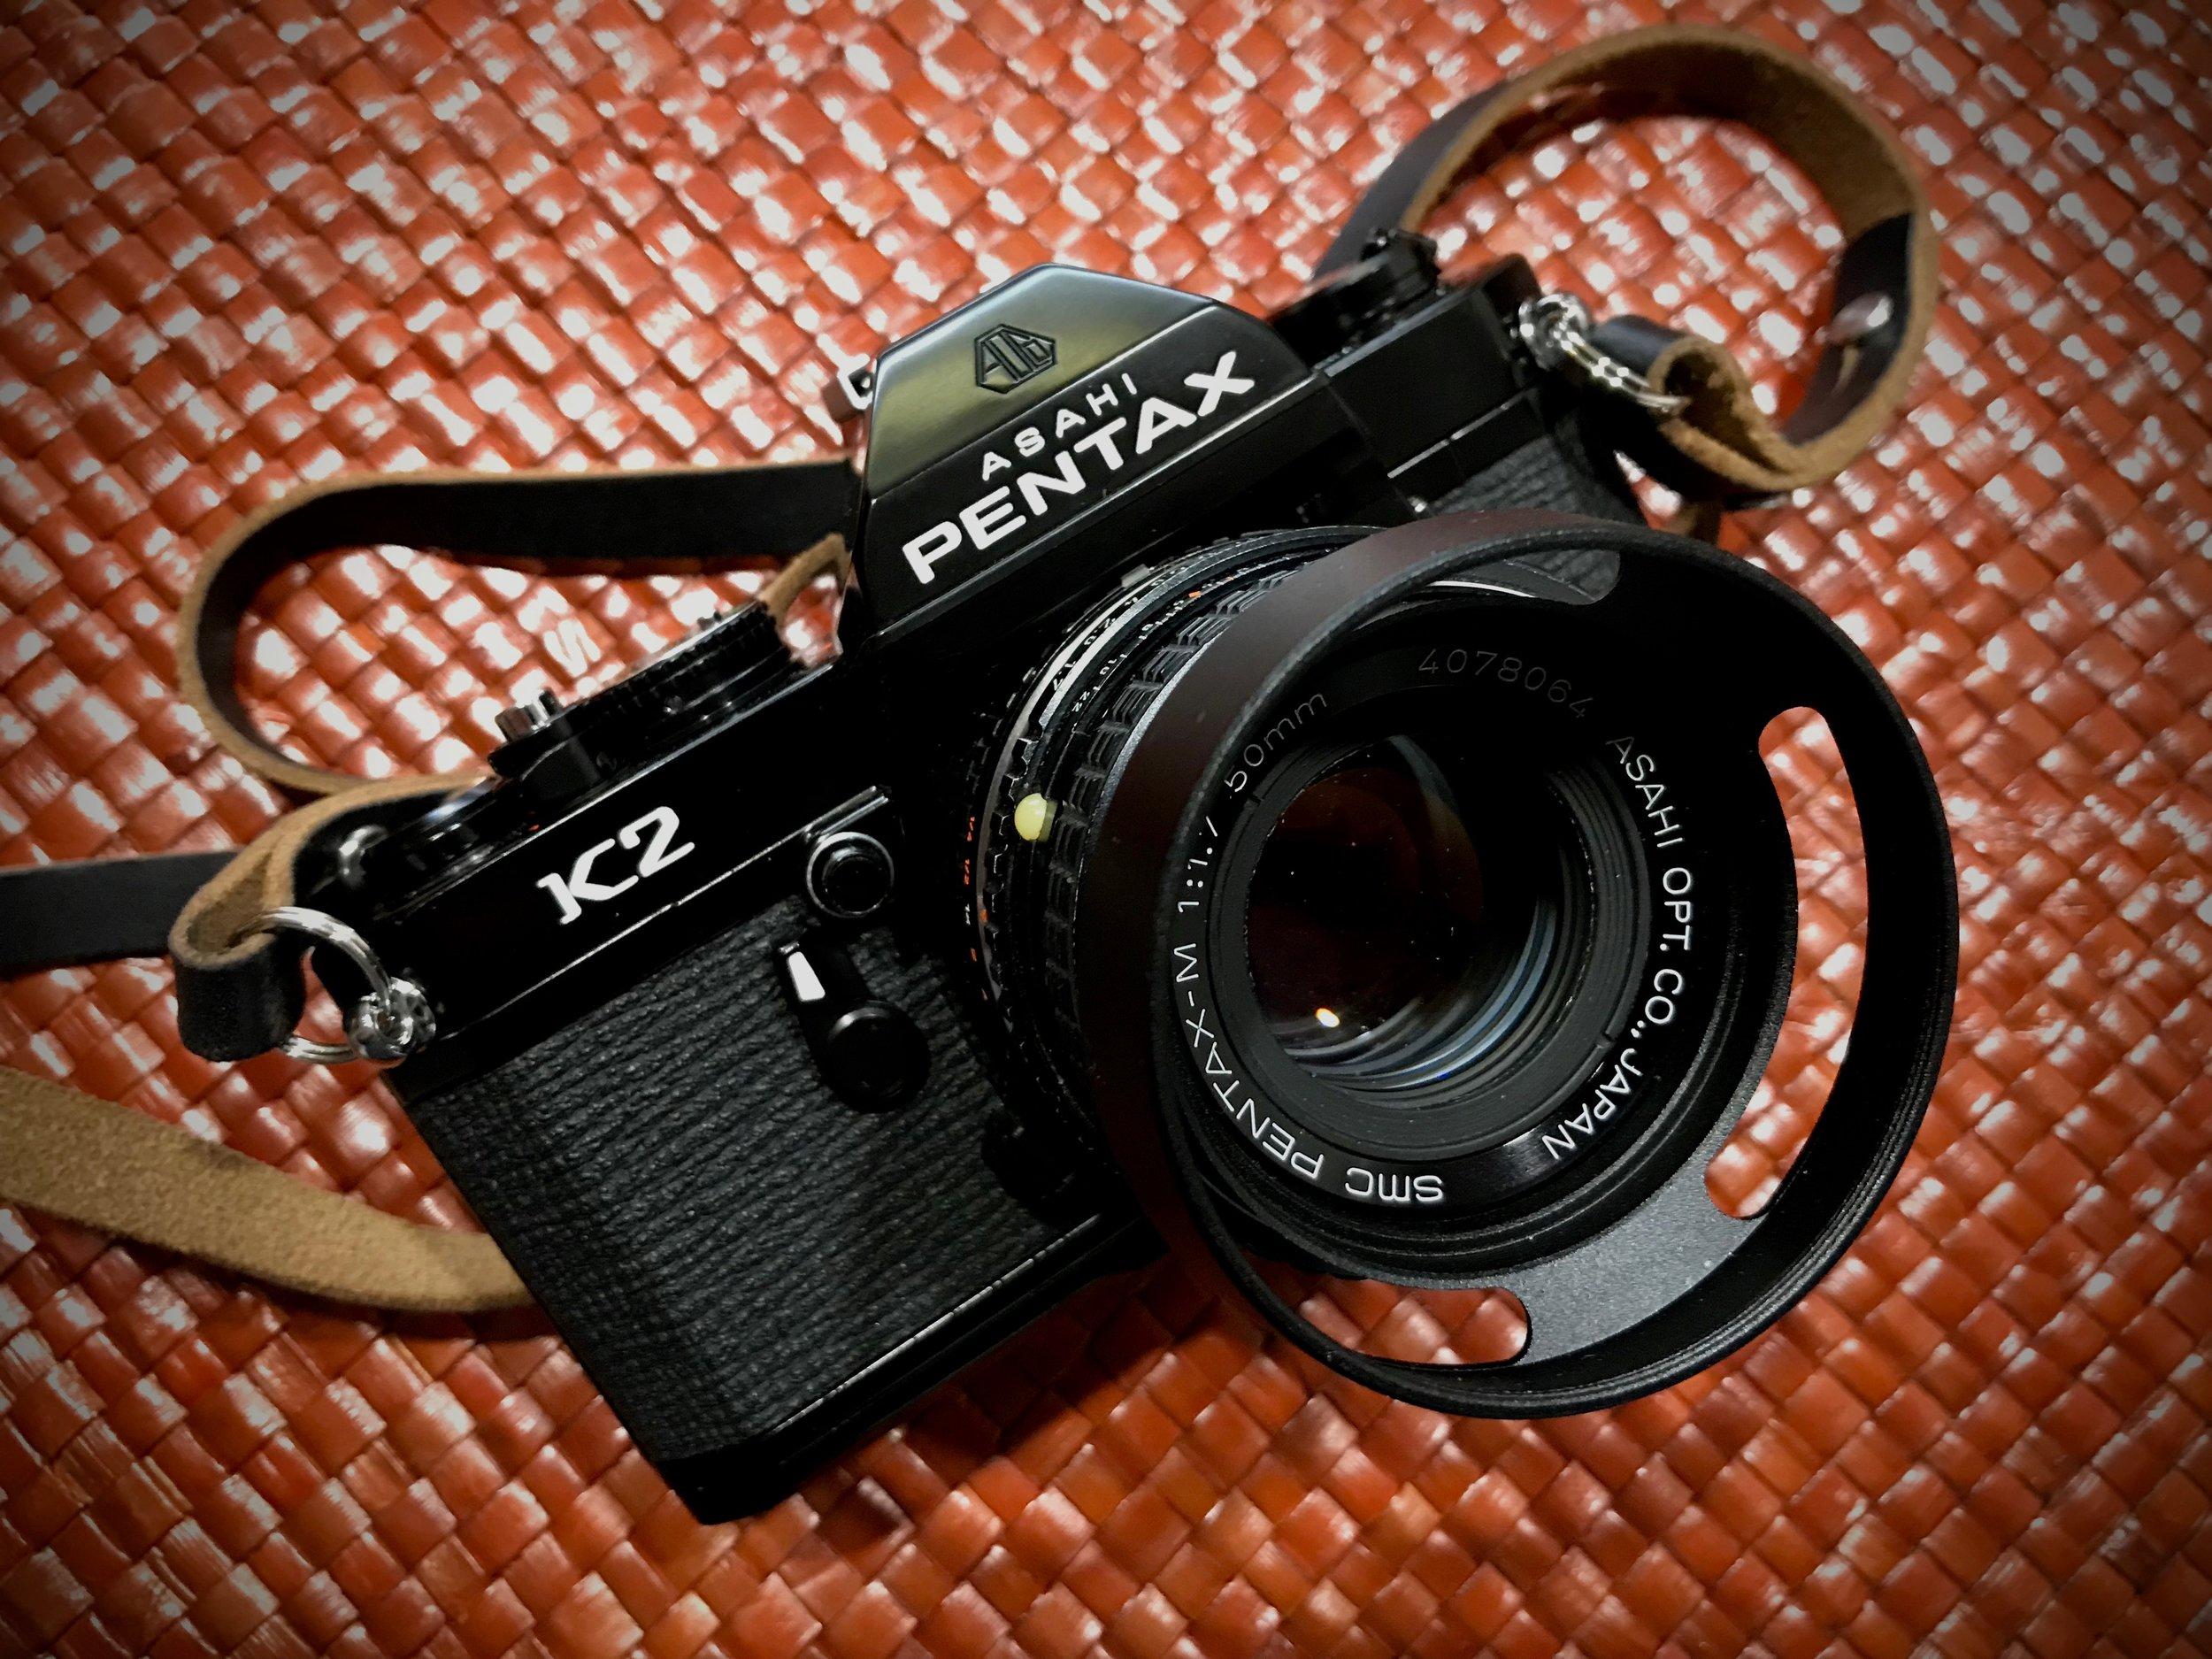 Pentax K2, SMC Pentax-M 50mm f/1.7 kit lens